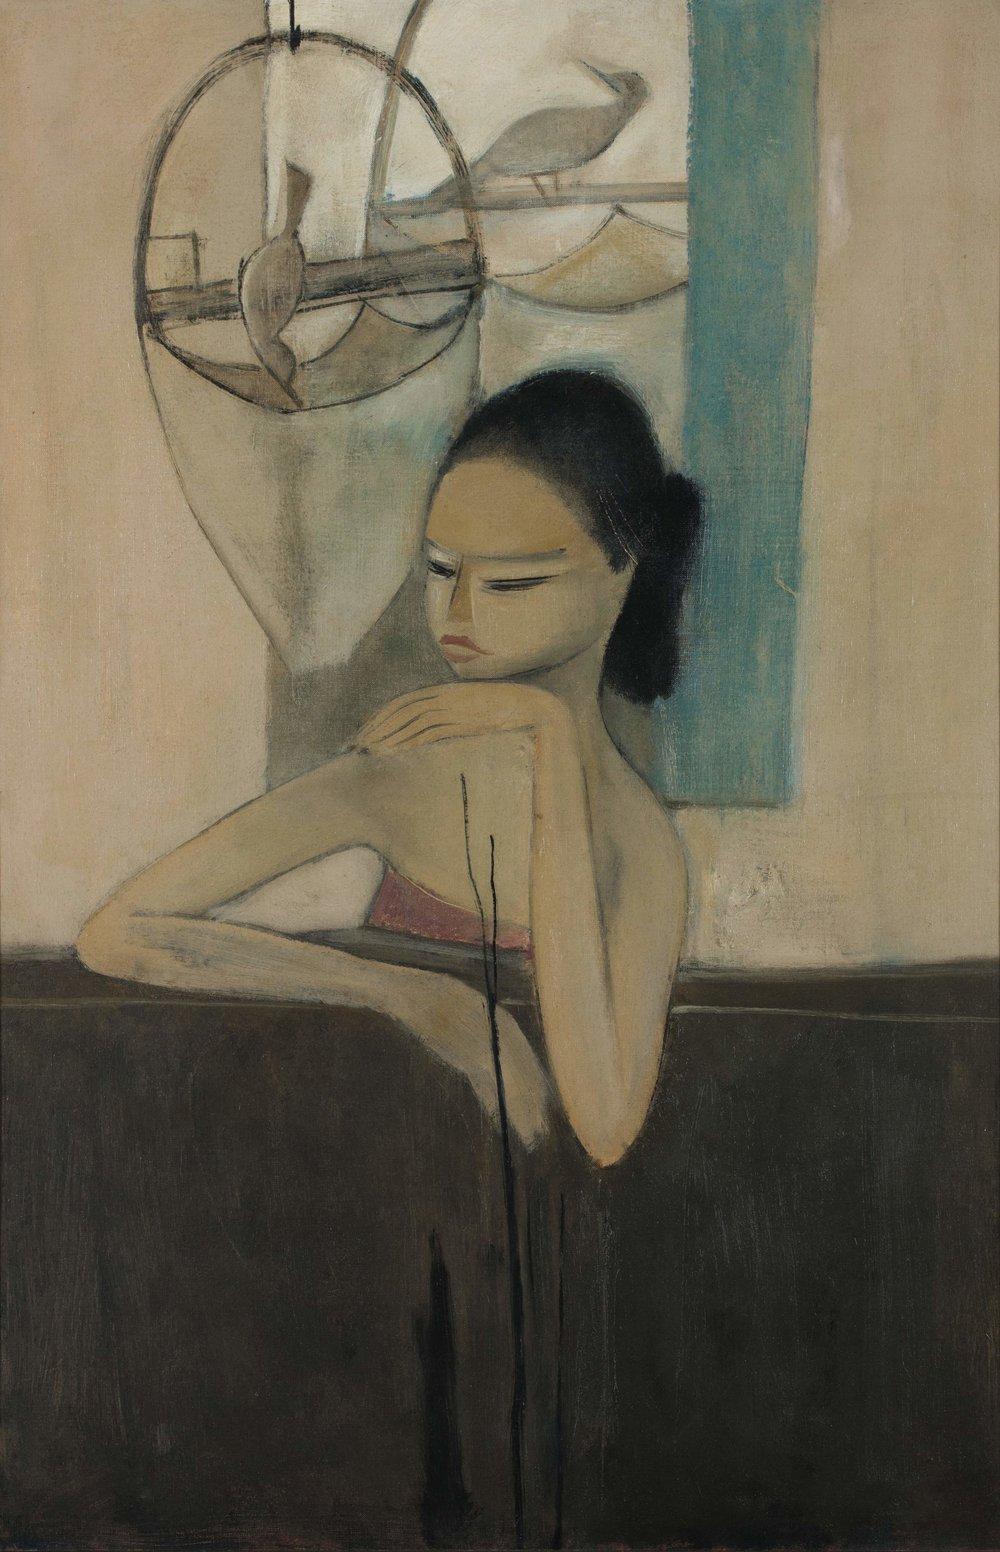 Cheong Soo Pieng (1917 - 1983)